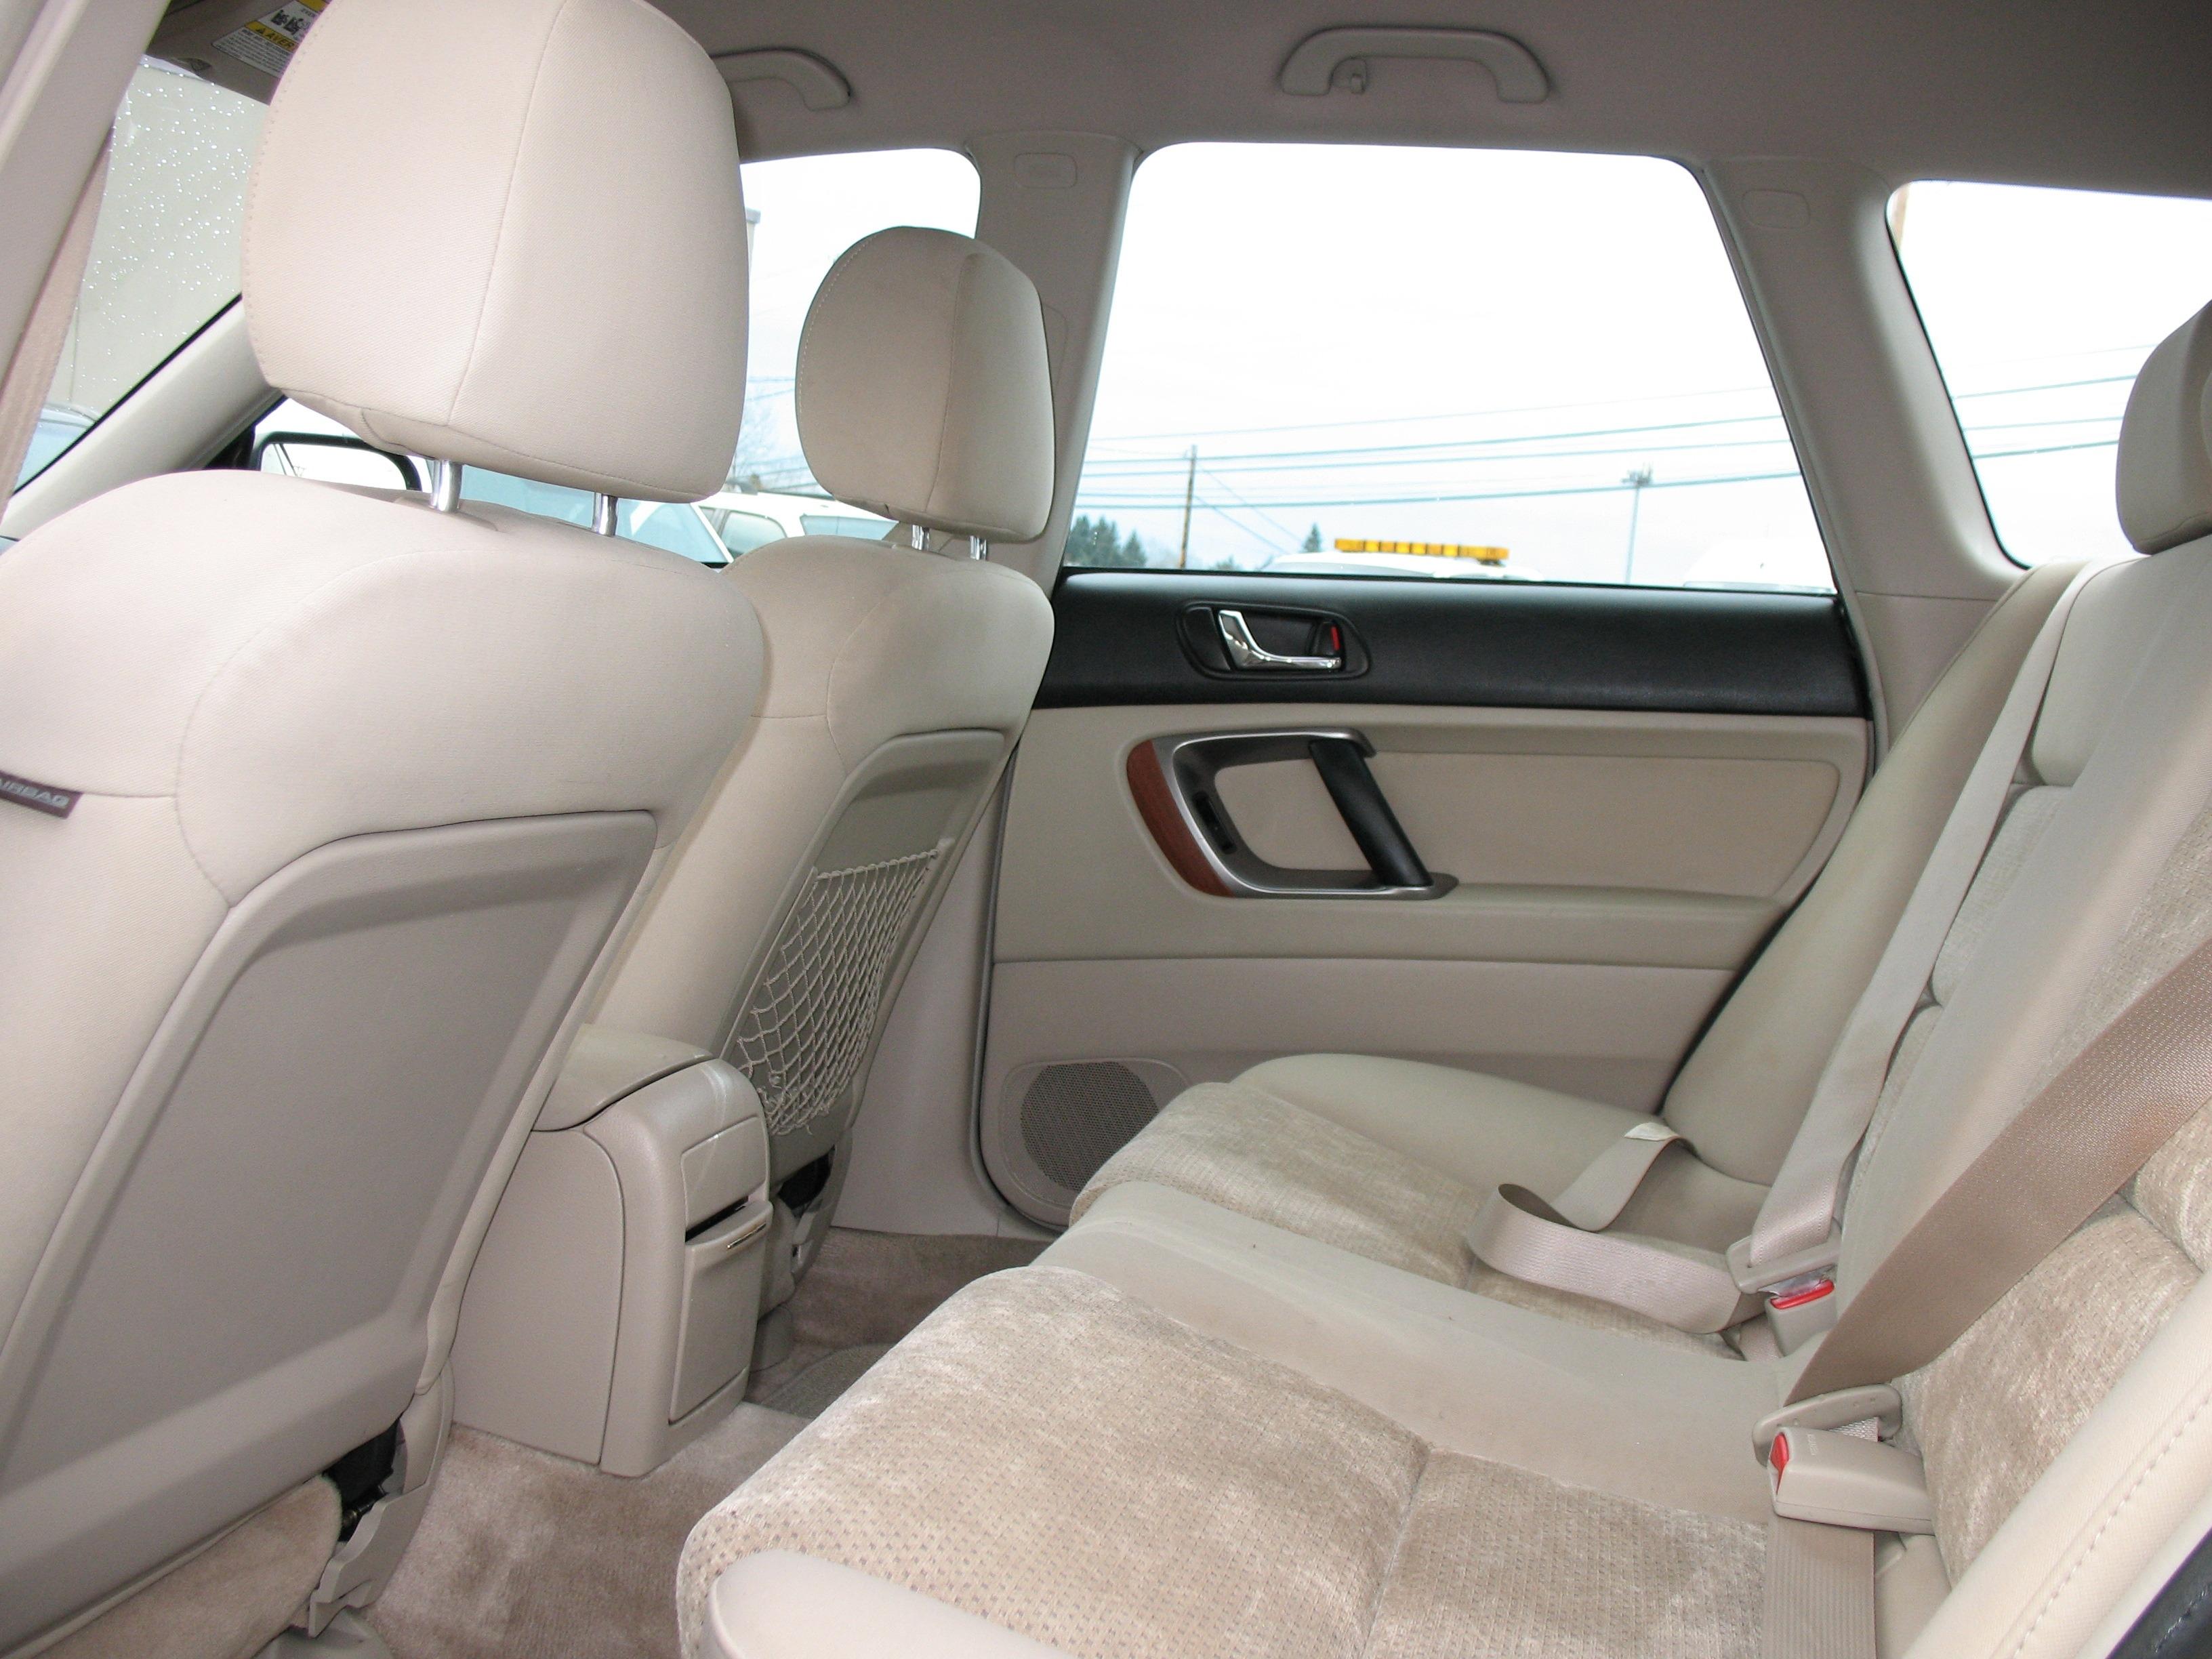 2005 Subaru Outback Seat Wiring